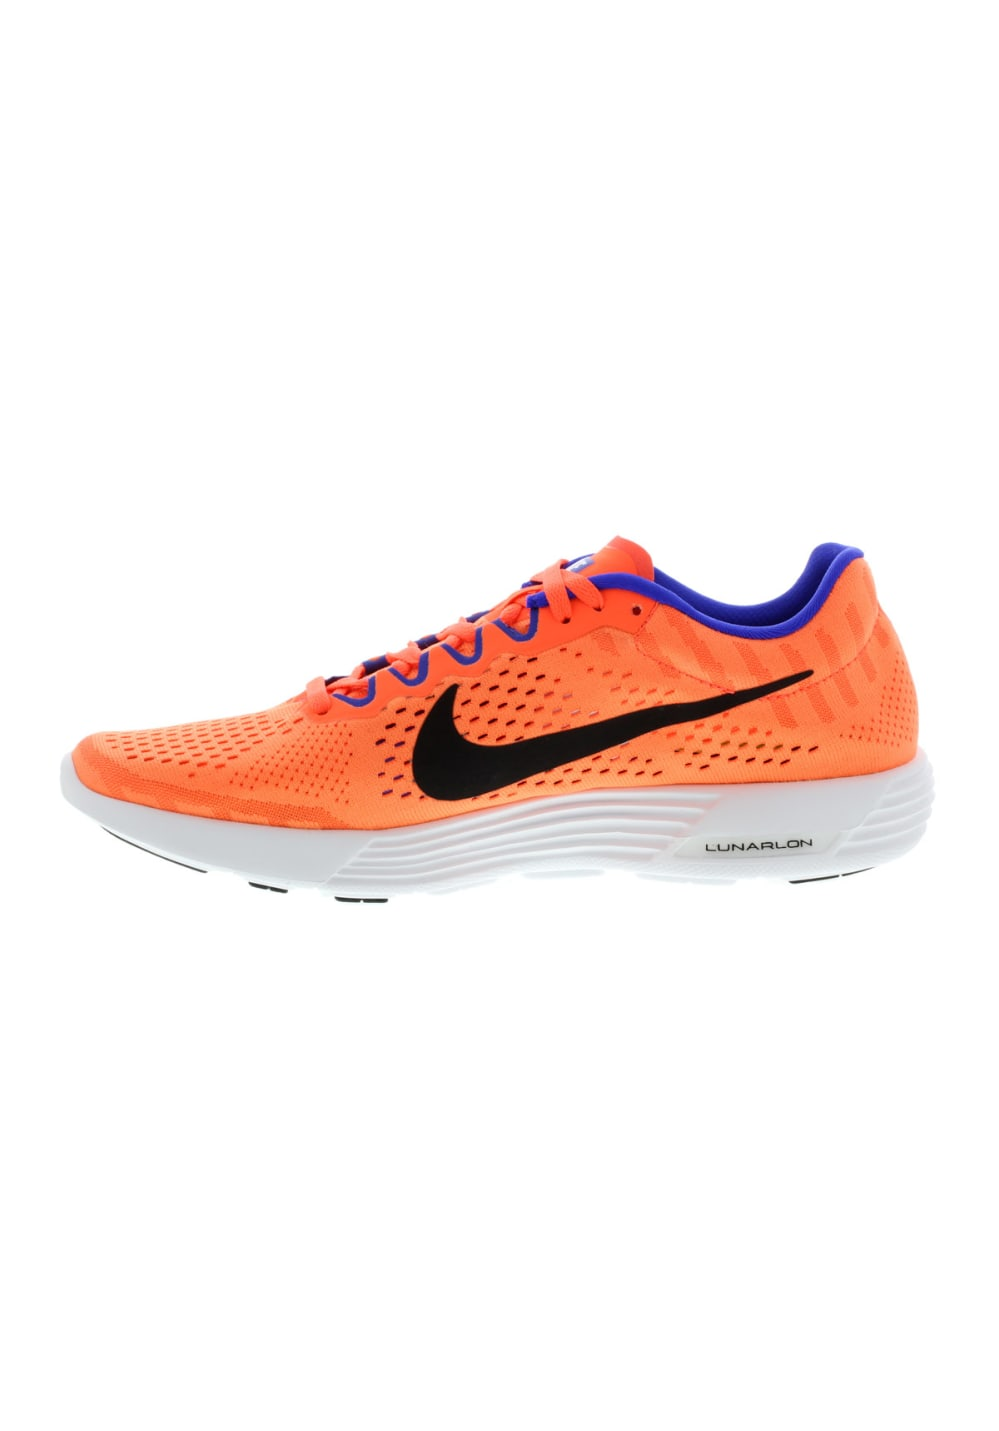 san francisco fa79b a54ed Nike Lunaracer 4 - Running shoes for Men - Orange   21RUN